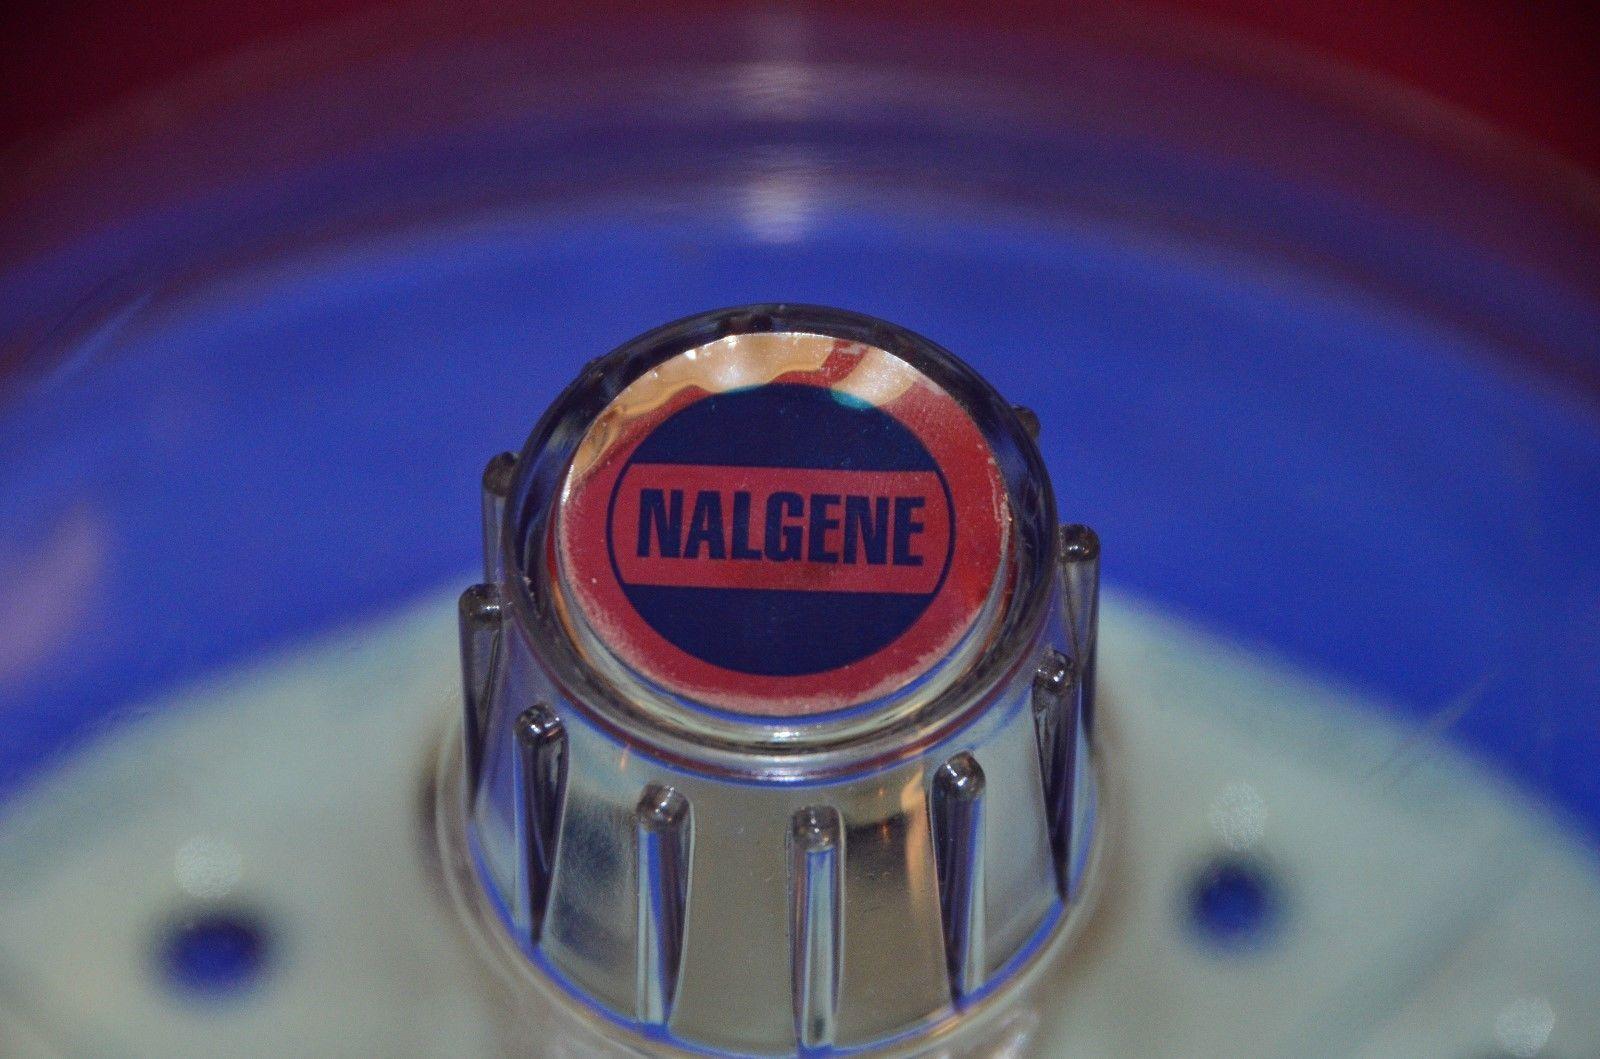 Nalgene 250mm Plastic Desiccator with Nalge Sybron Nucerite 5312 Plate